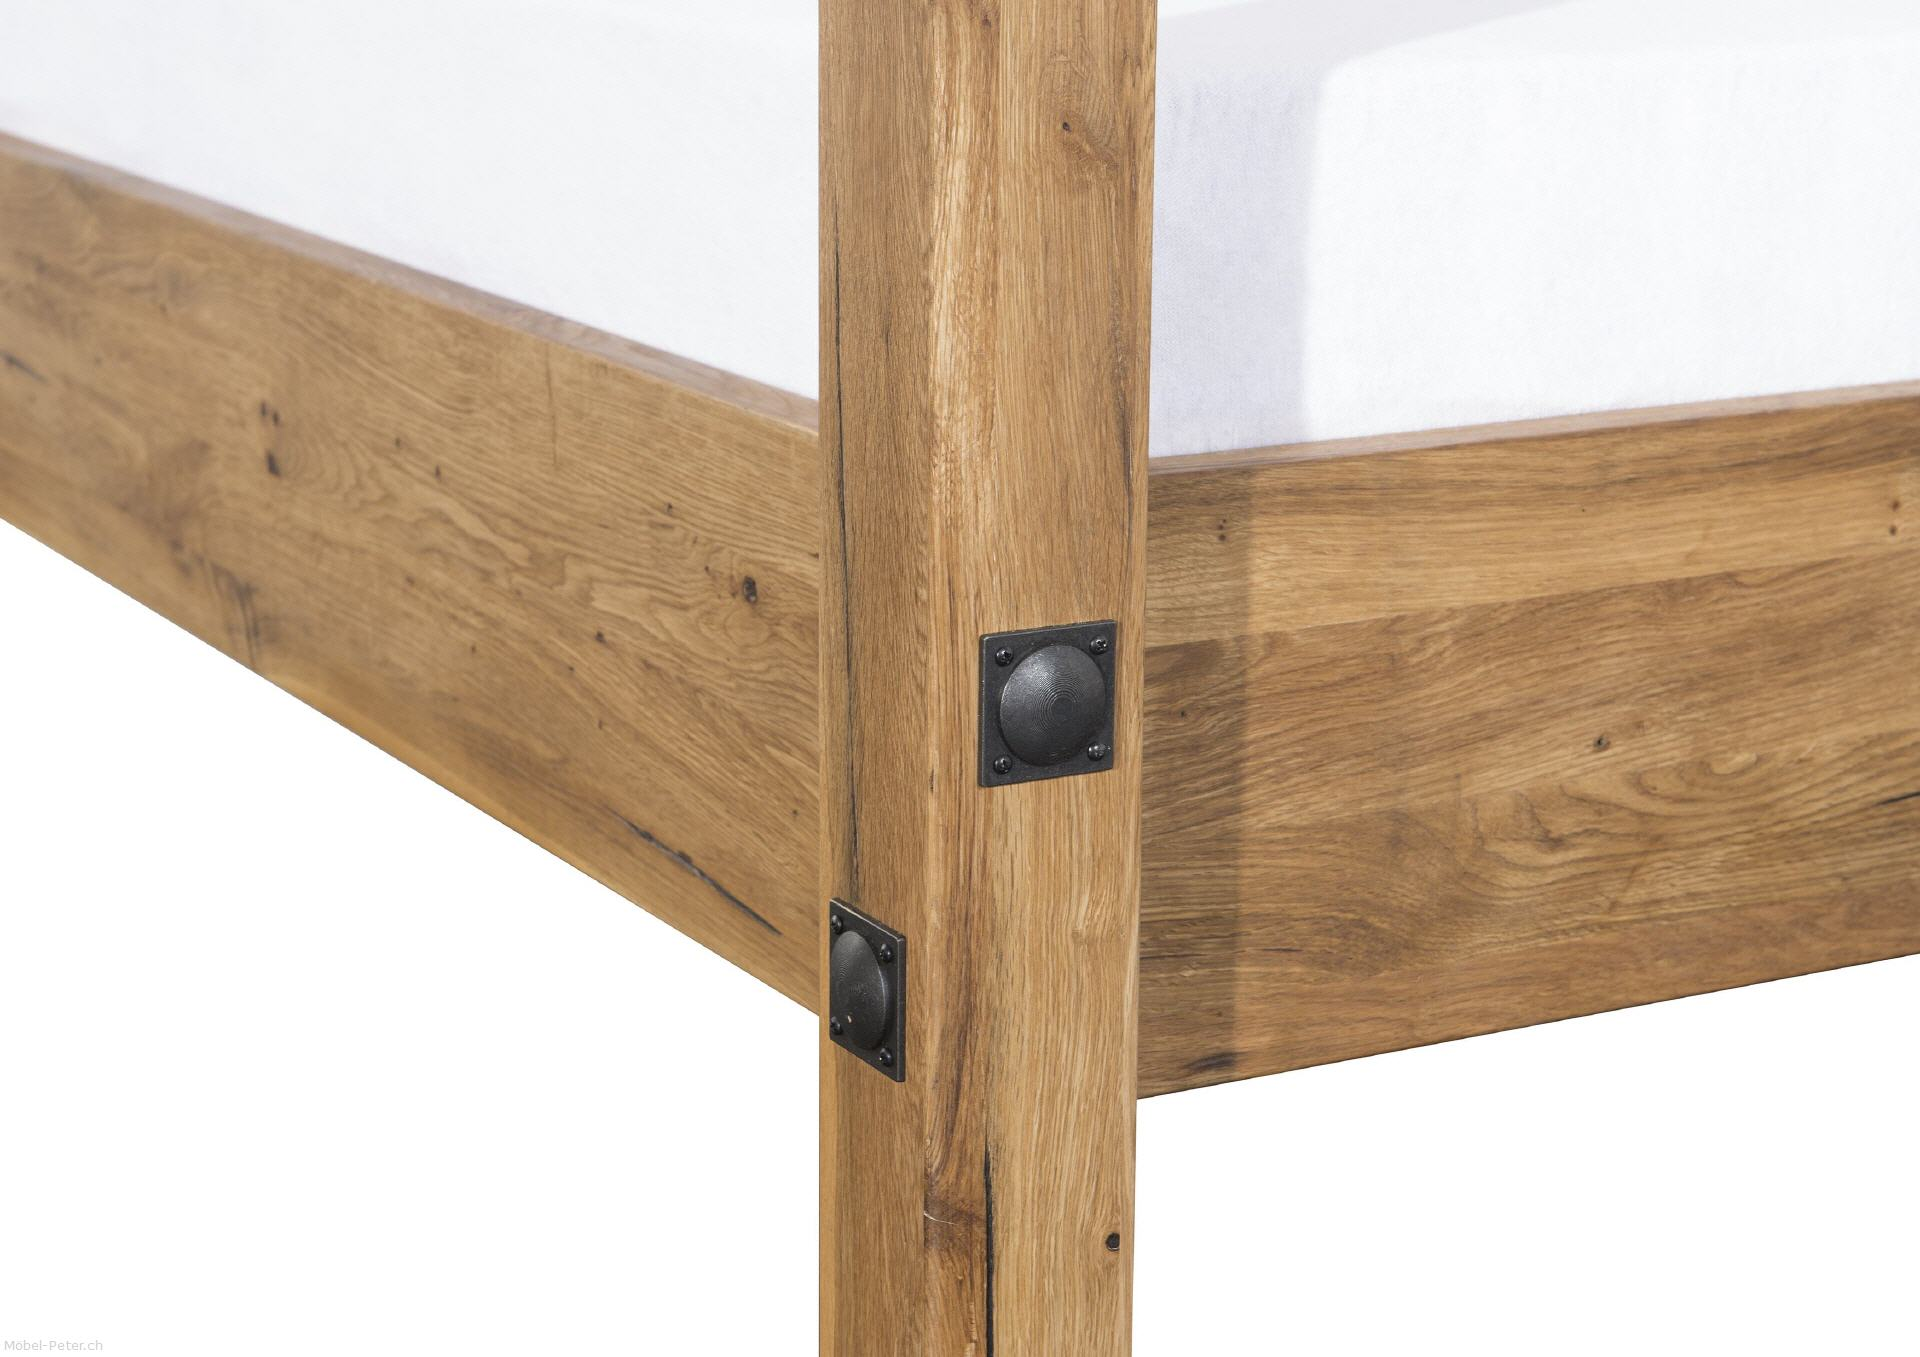 schlafzimmer ideen mit goldener tapete. Black Bedroom Furniture Sets. Home Design Ideas